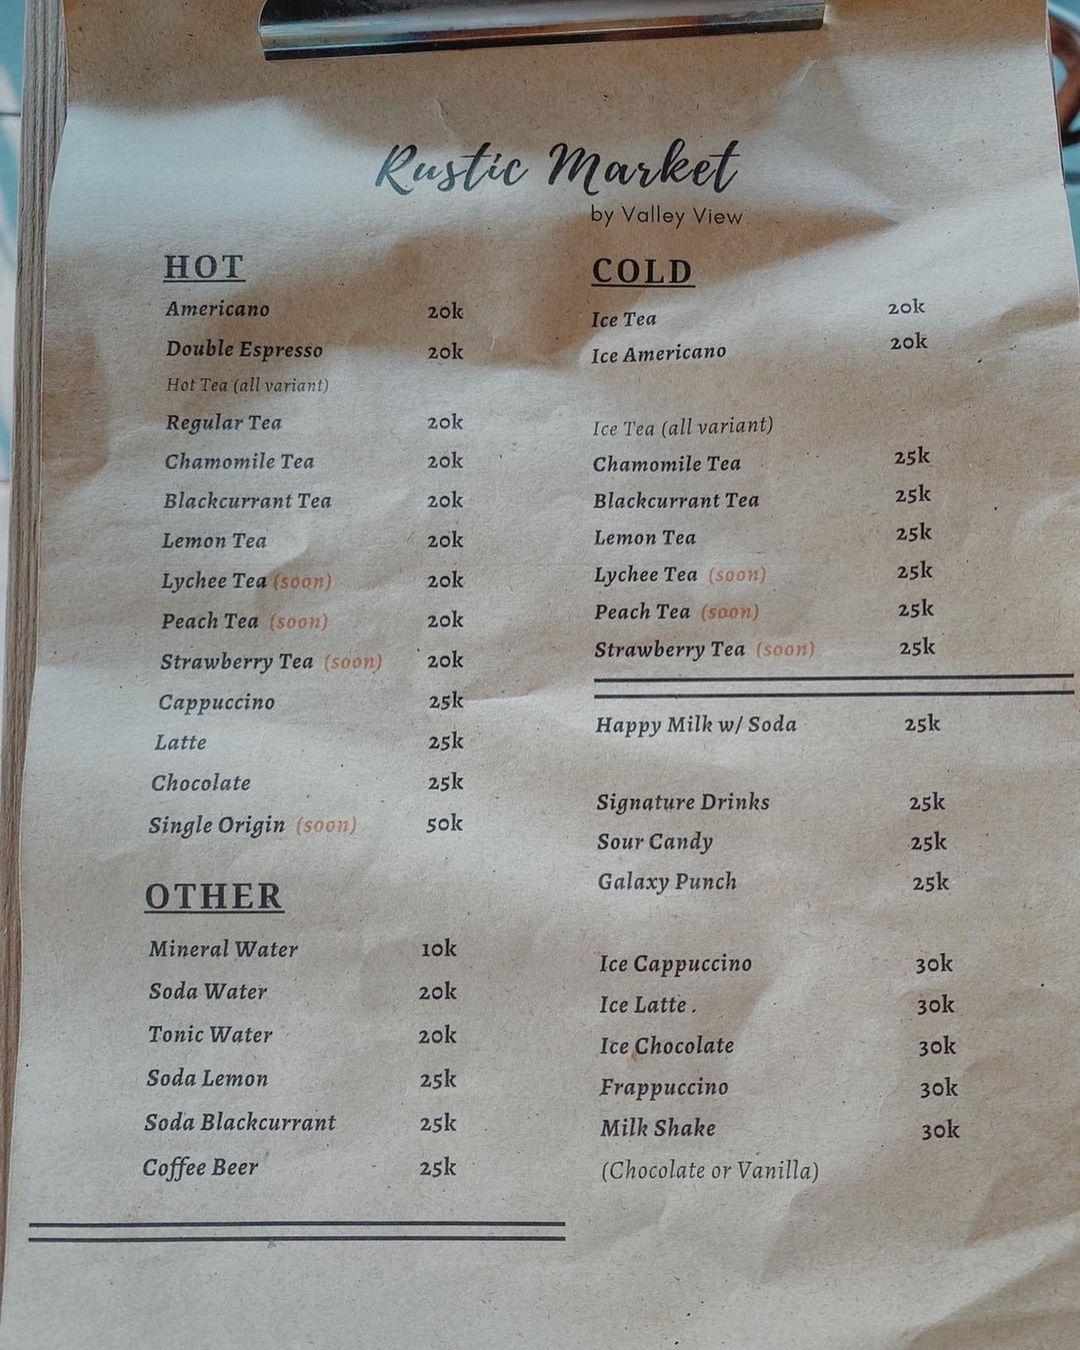 Menu Minuman Di Rustic Market Trawas Mojokerto Image From @niceplace Sub_